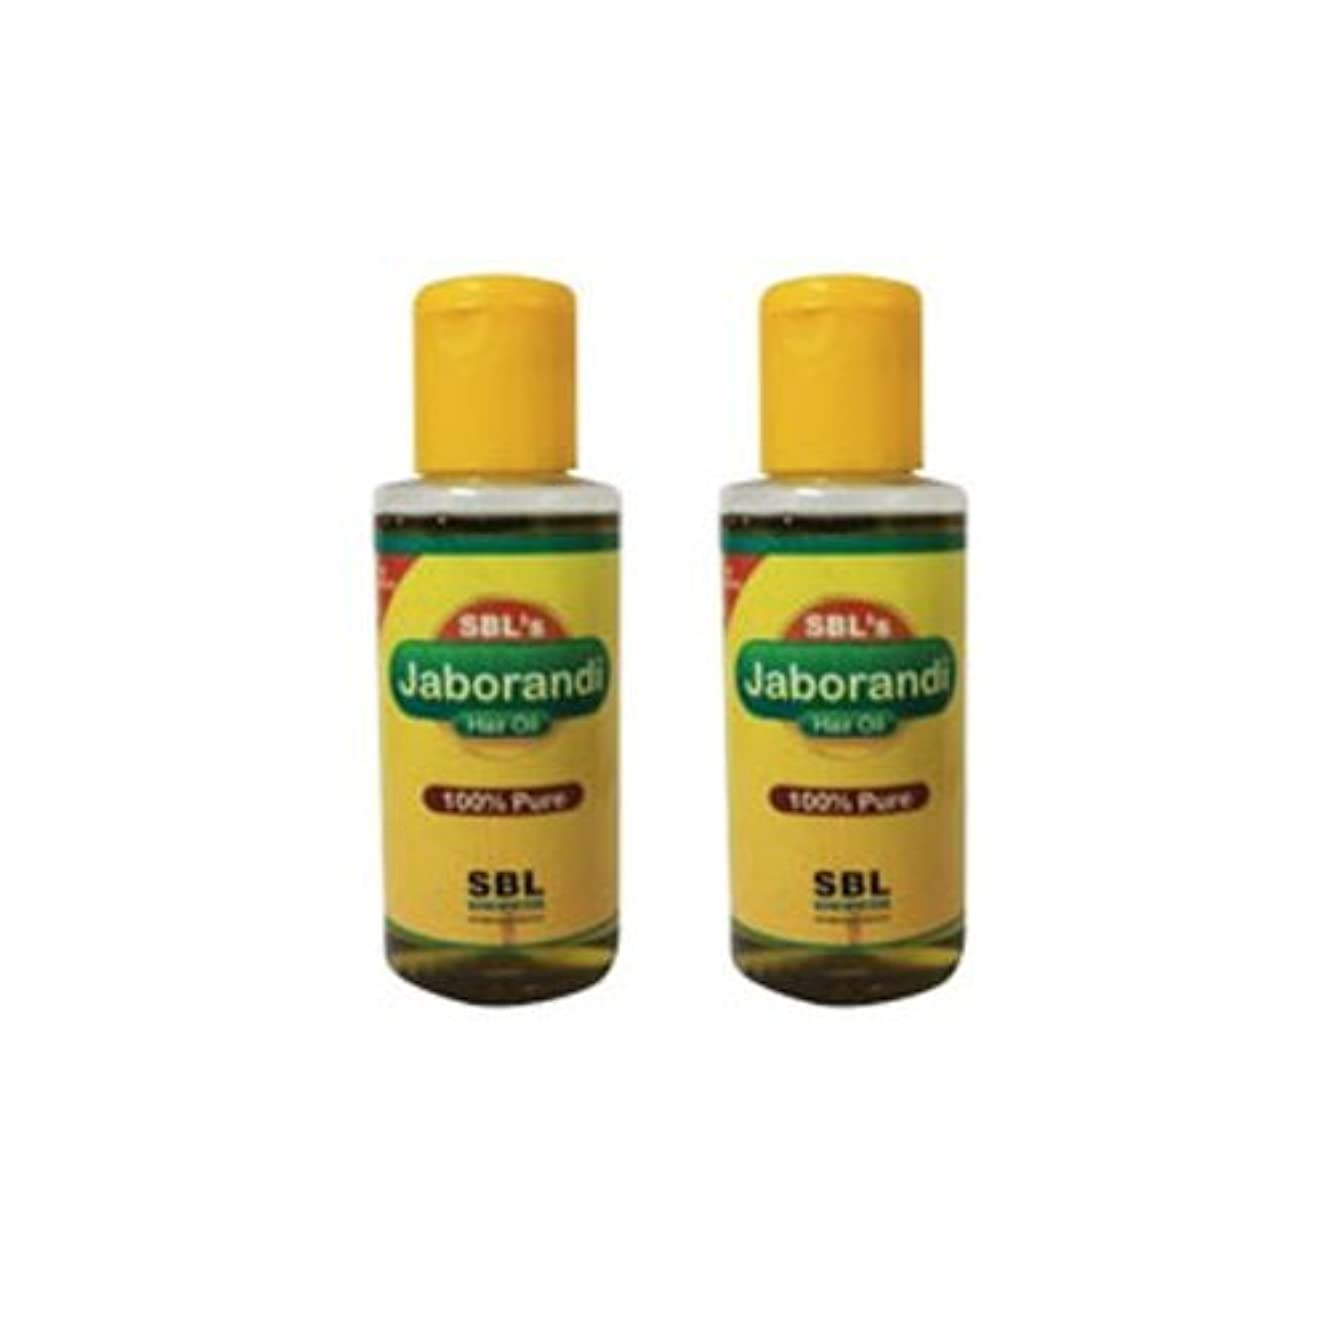 2 x Jaborandi Hair Oil. Shipping Only By - USPS / FedEX by SBL